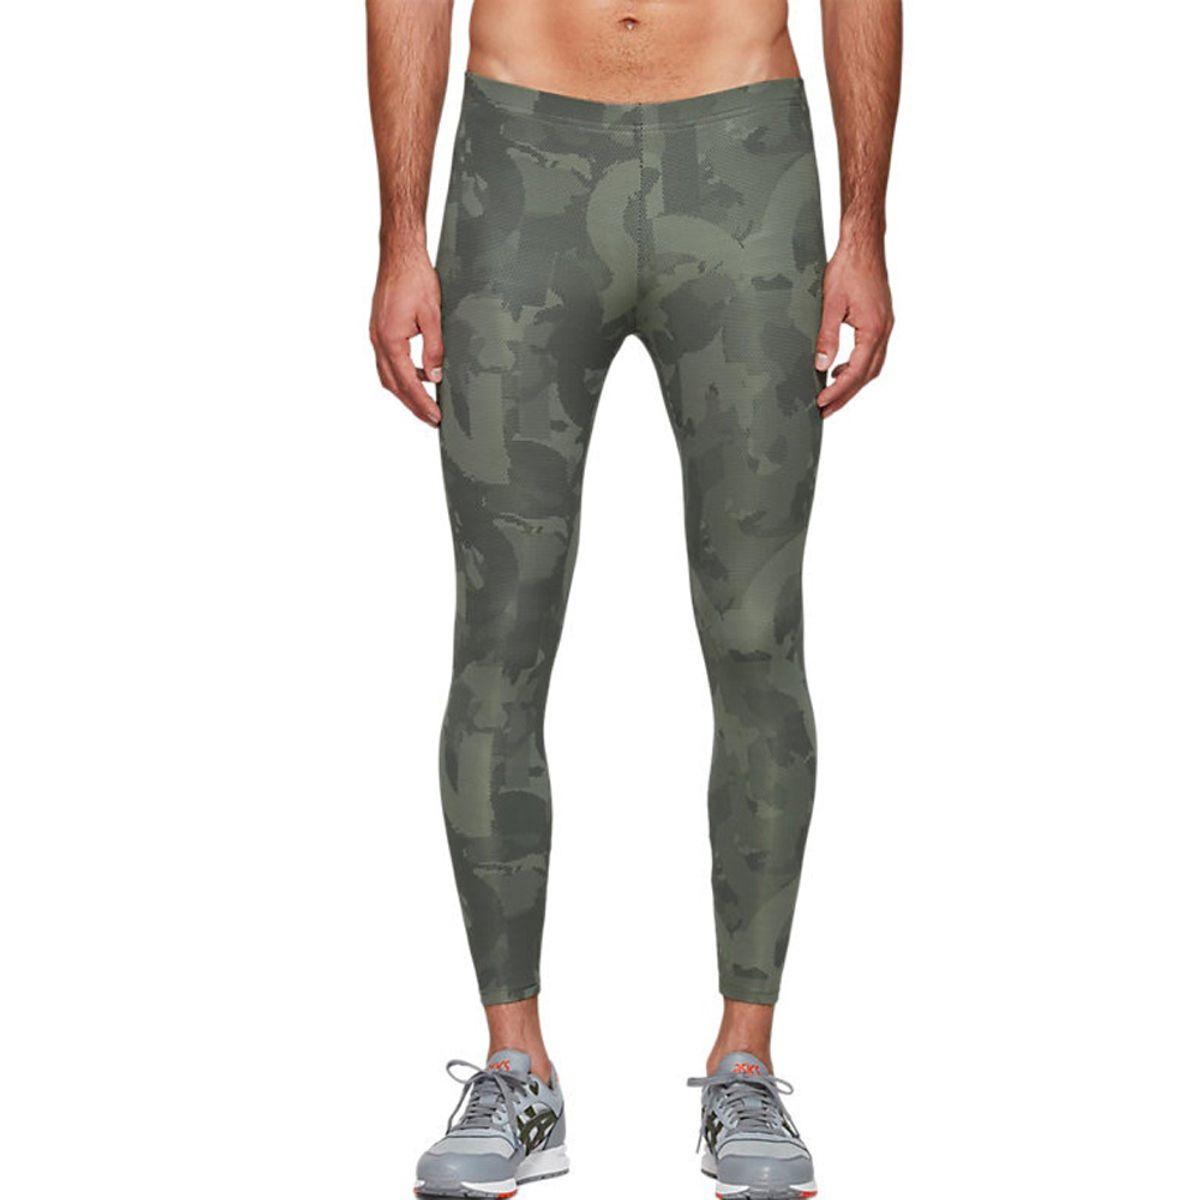 Calca-Asics-Tight---Masculino---Verde